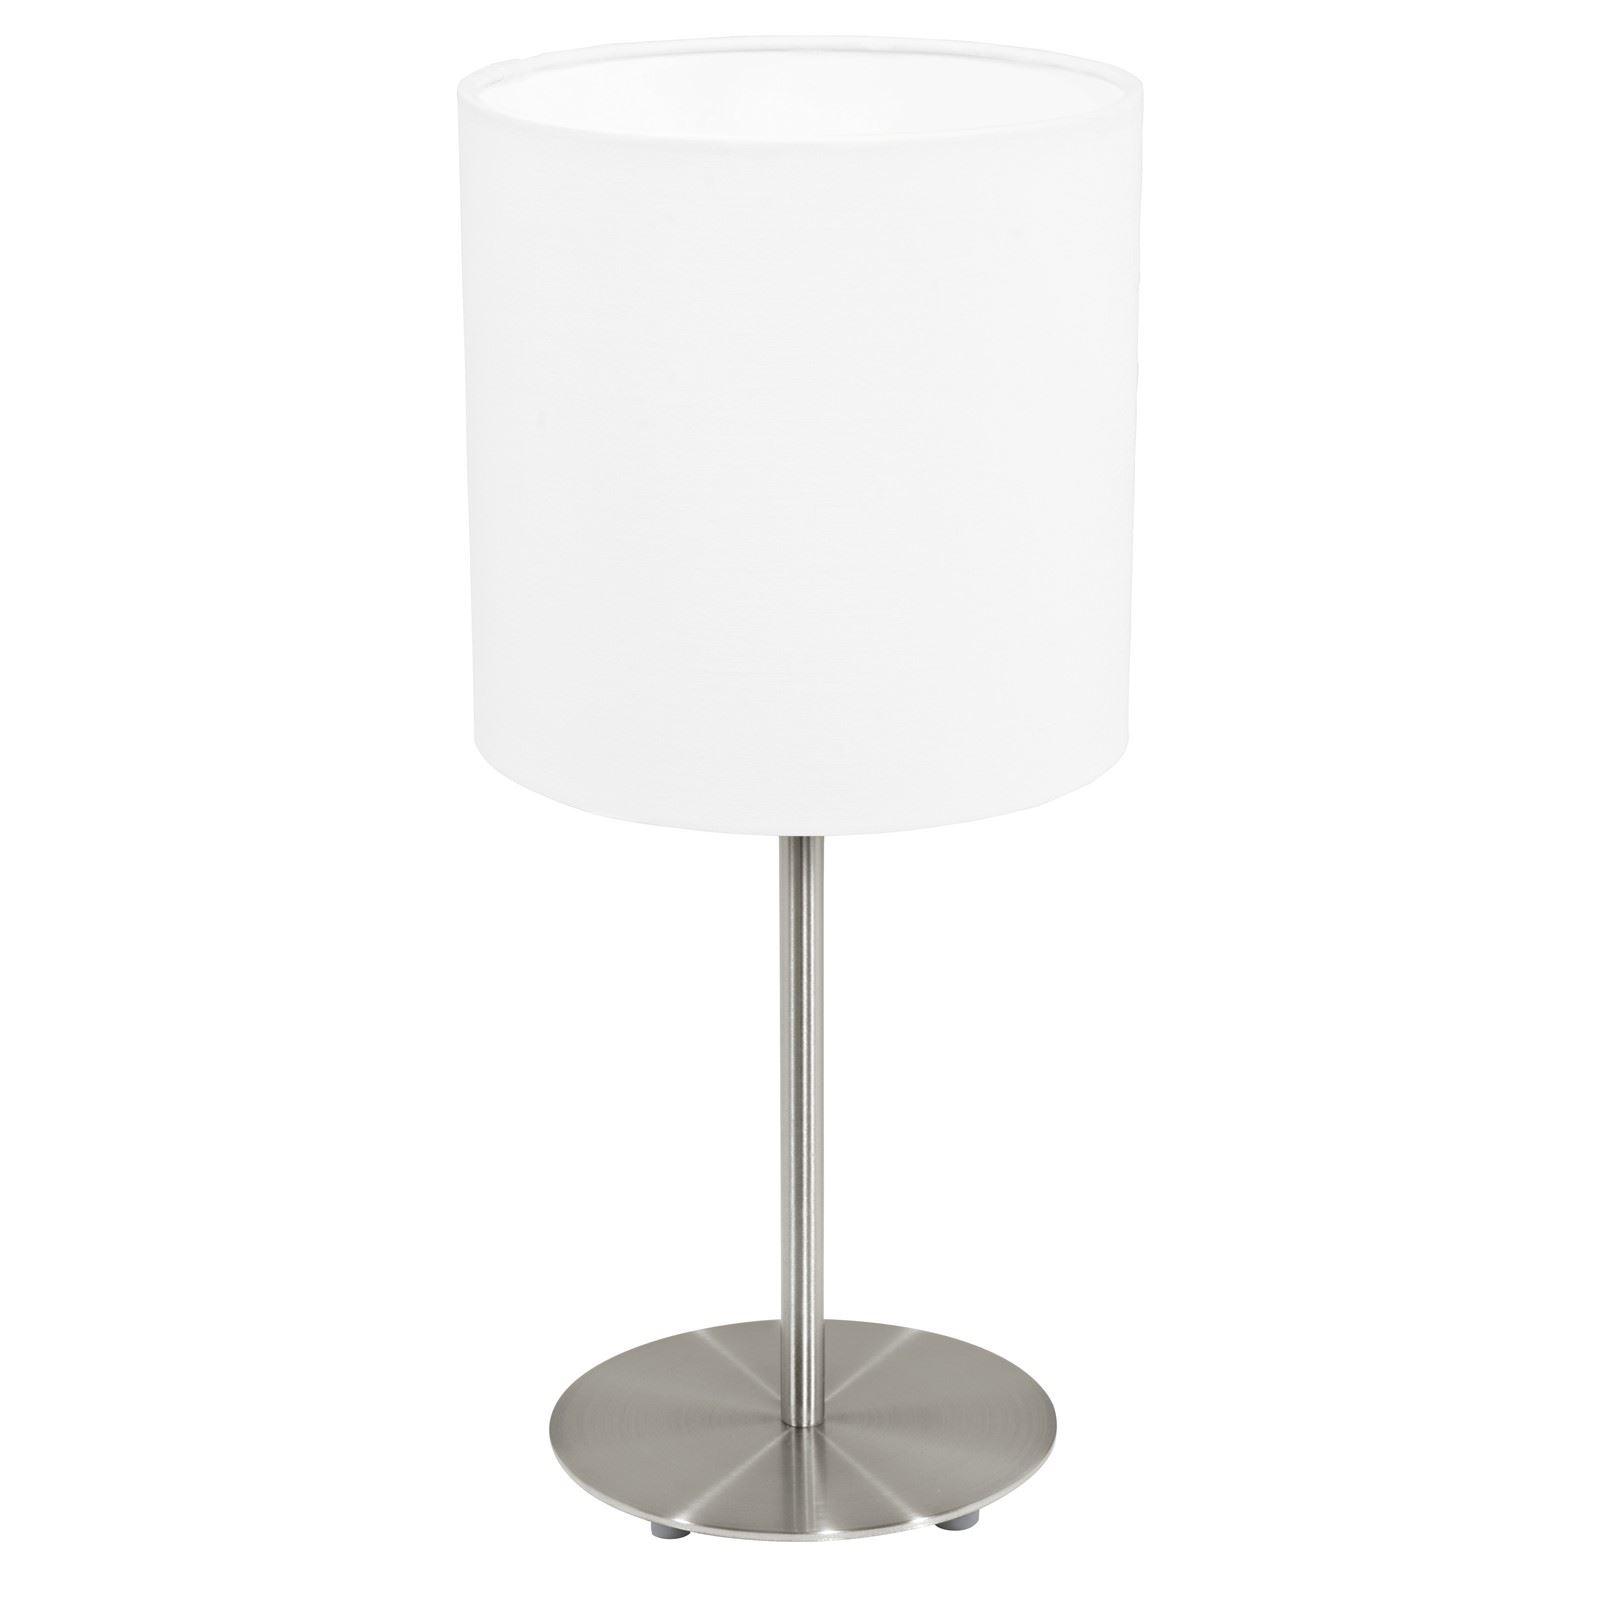 Pasteri Matt White Shade Steel Satin Nickel Table Lamp 1 Light E27